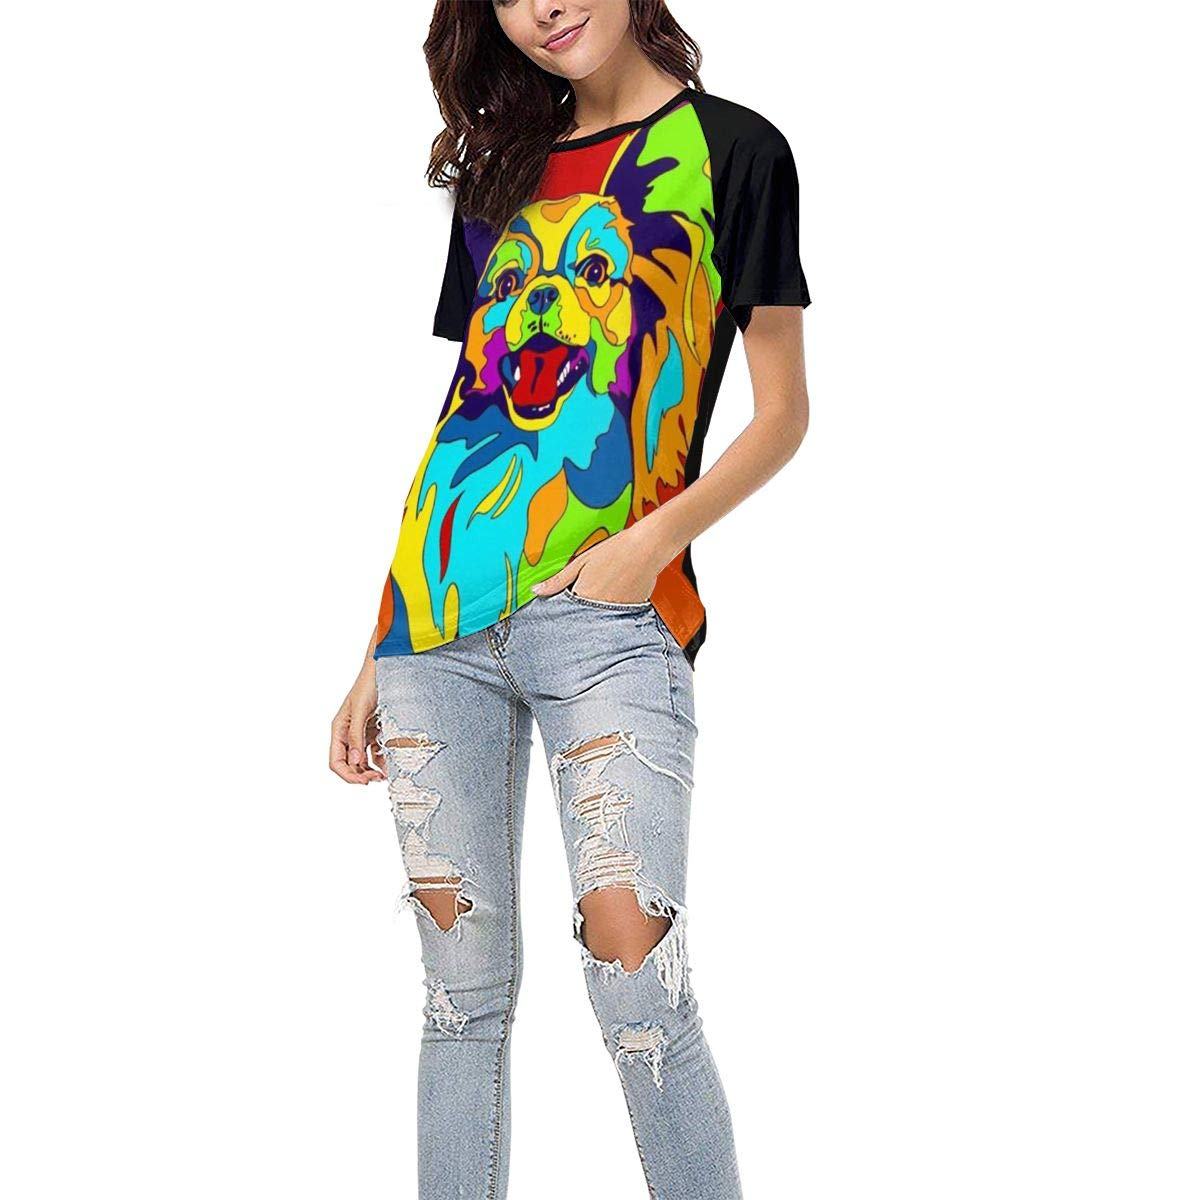 QWXZC Multi-Color Papillon Womens Short Sleeves Baseball Tee Casual Raglan Shirt Baseball Raglan T-Shirt.Black.